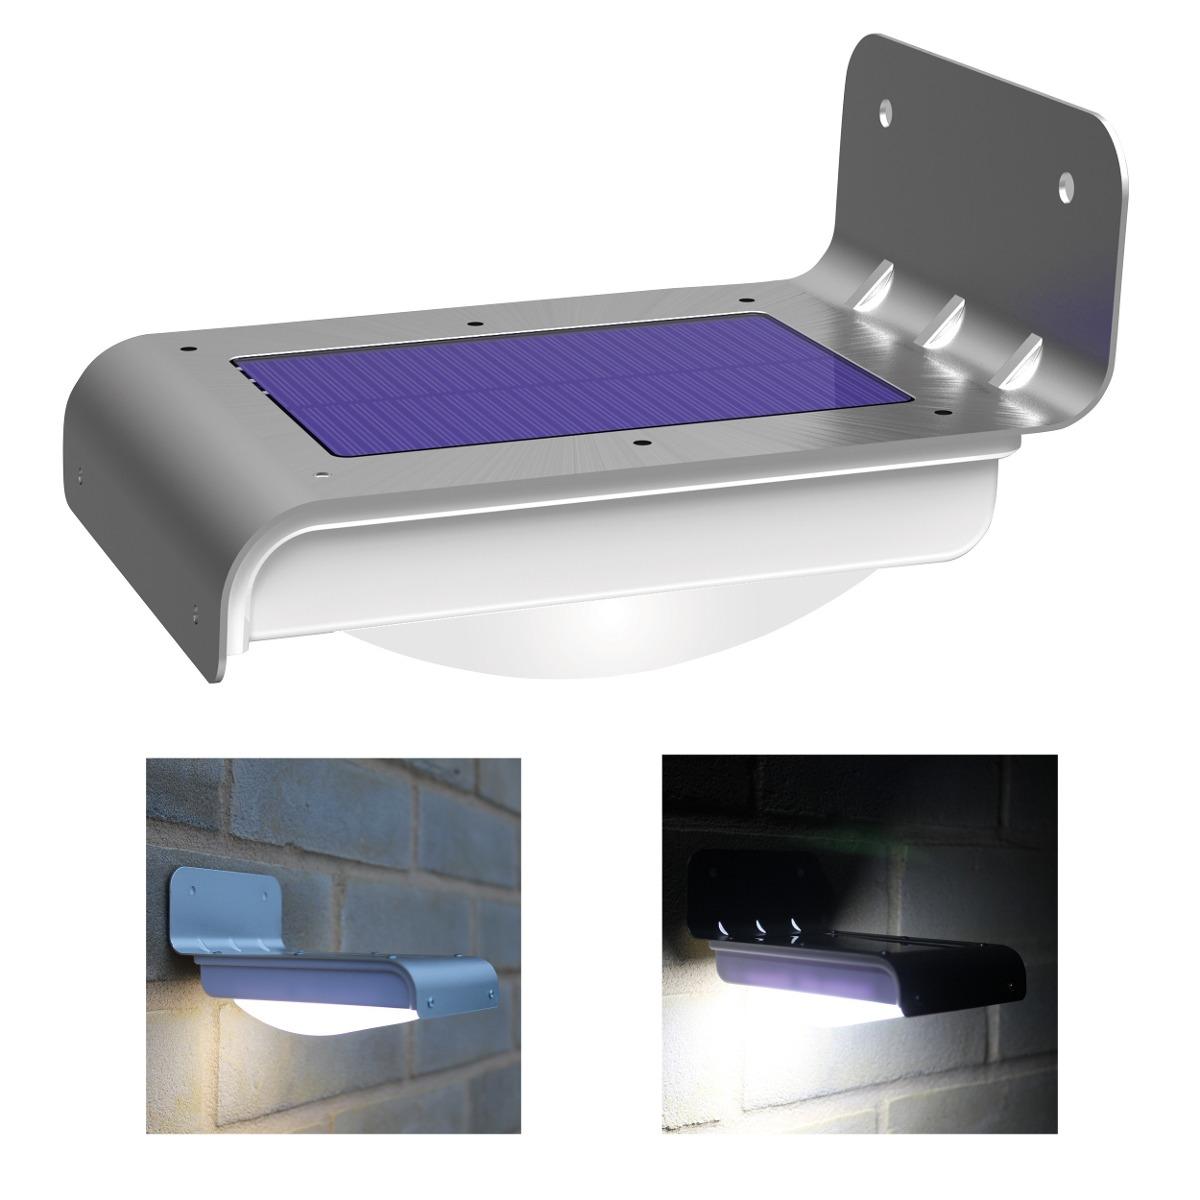 Foco solar 16 led con sensor de movimiento para exterior en mercado libre - Sensores de movimiento para iluminacion ...